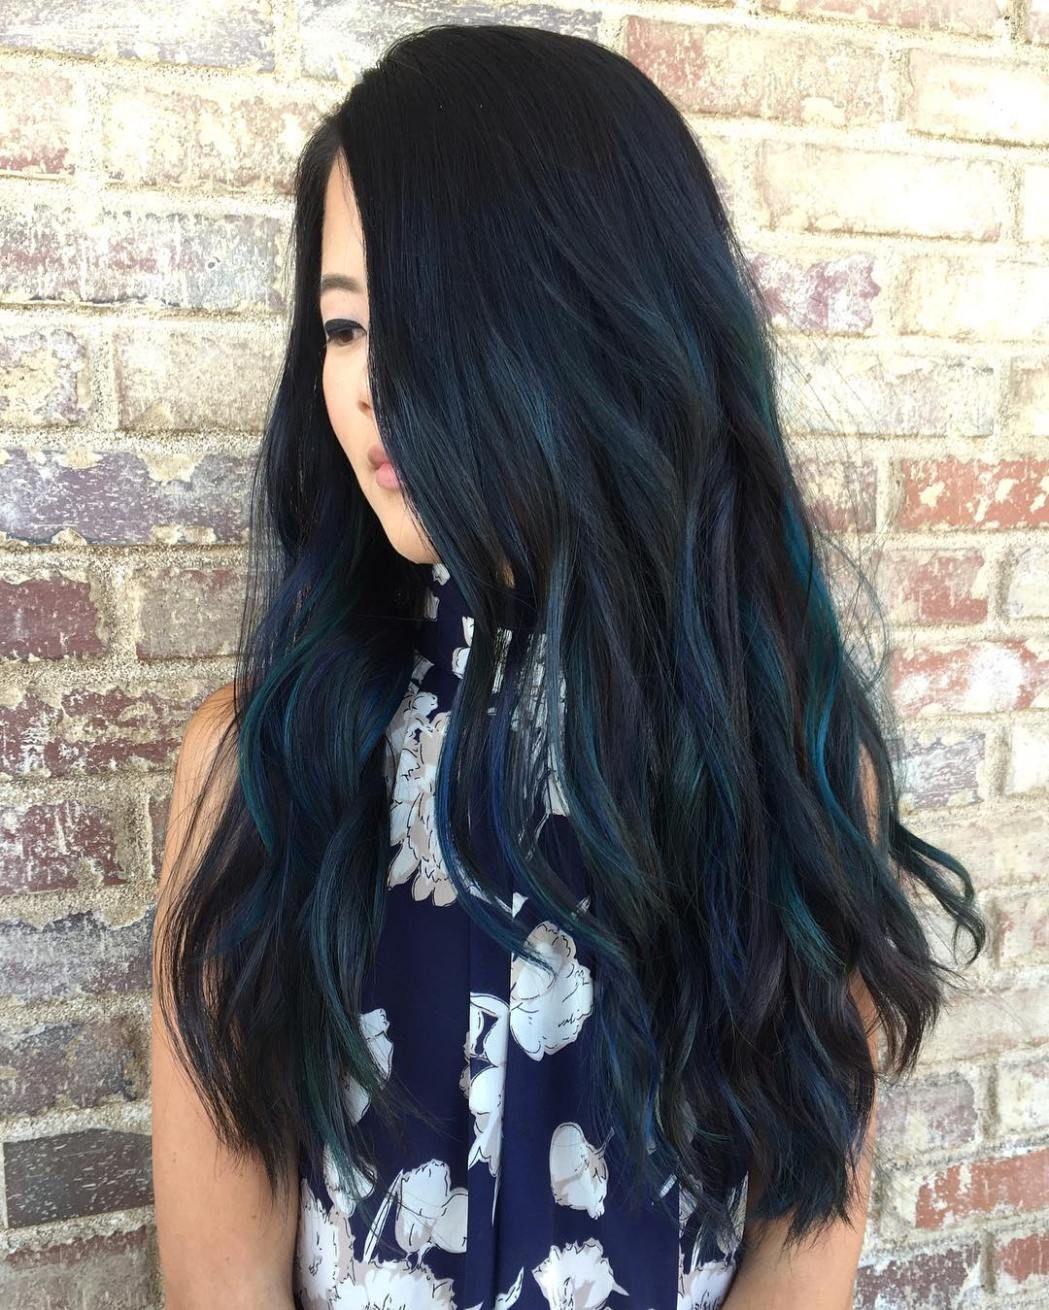 Blue Black Hair How To Get It Right Hair Pinterest Hair Blue